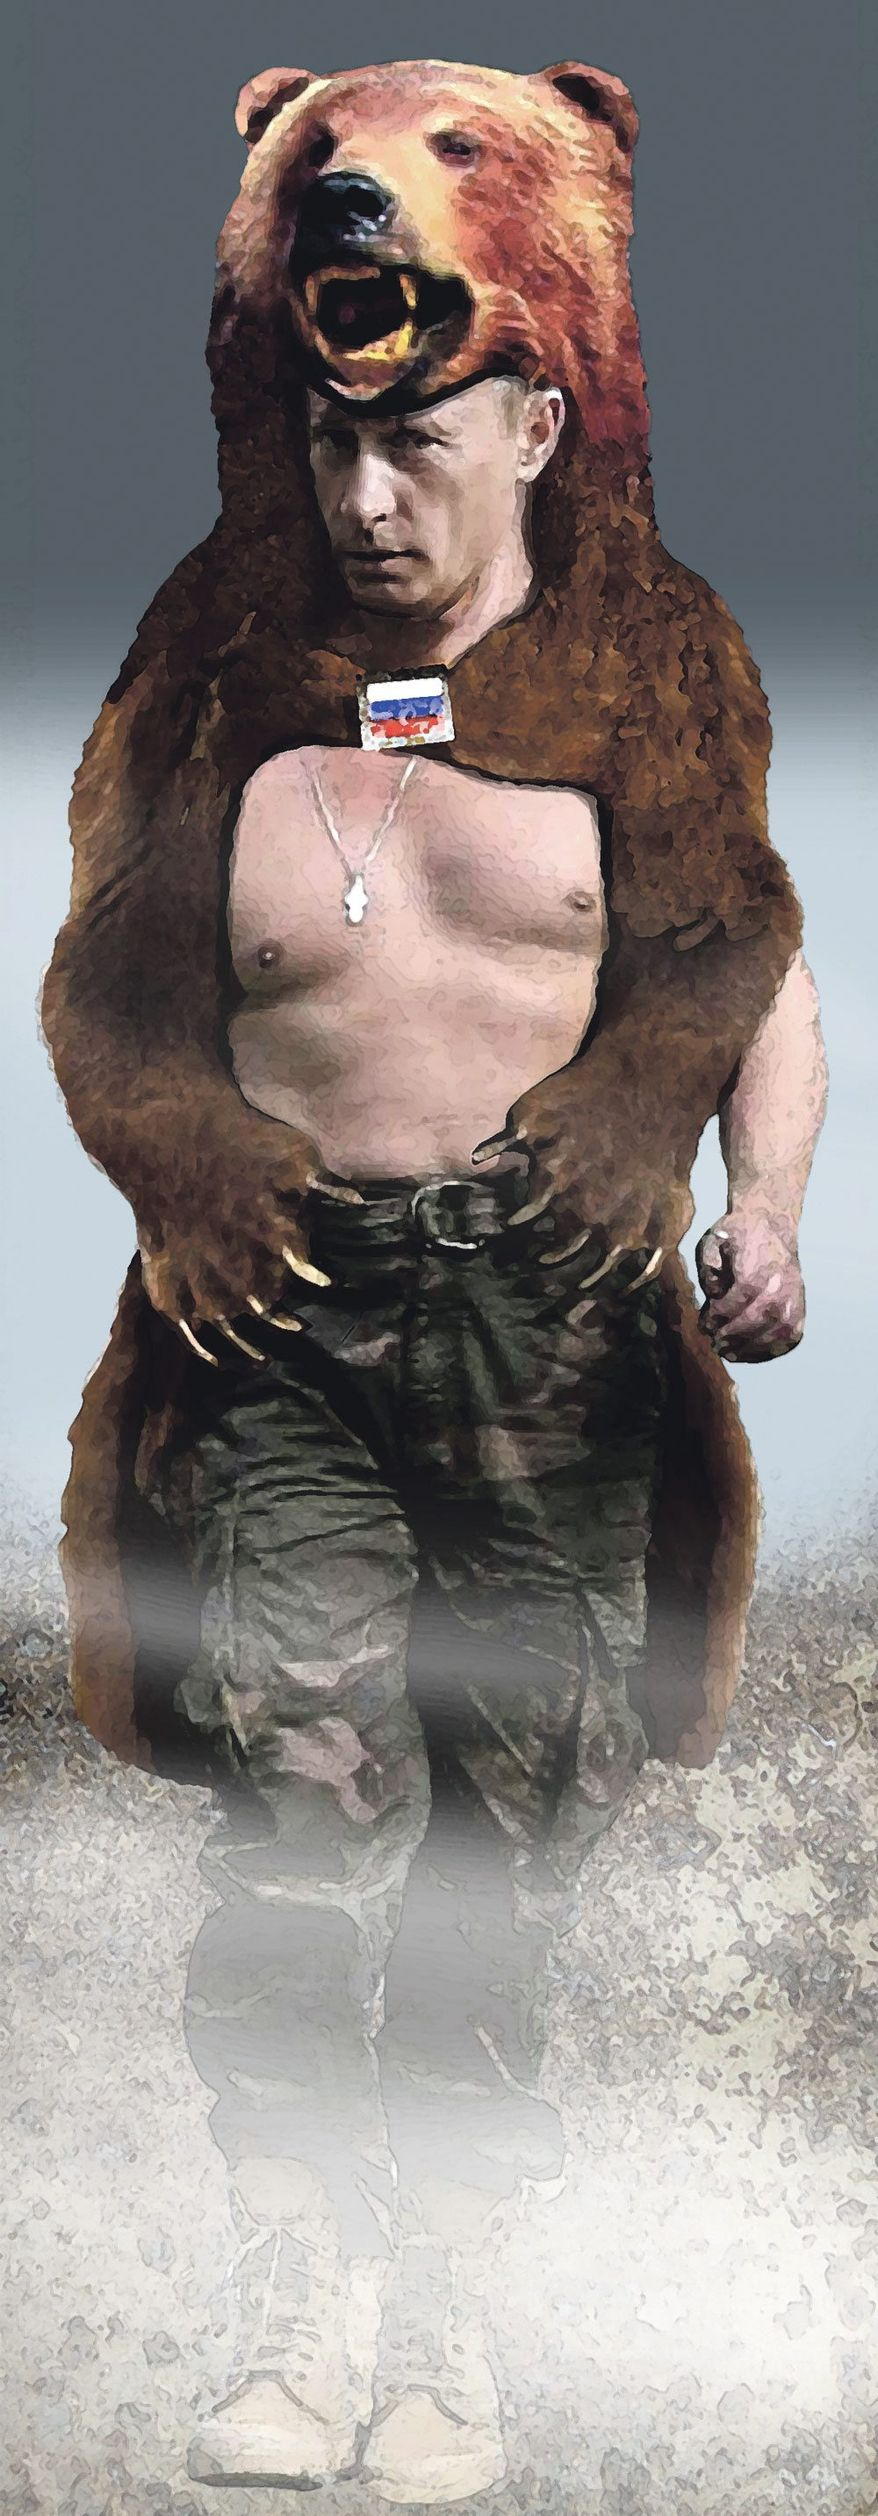 Illustration on Vladimir Putin by Alexander Hunter/The Washington Times